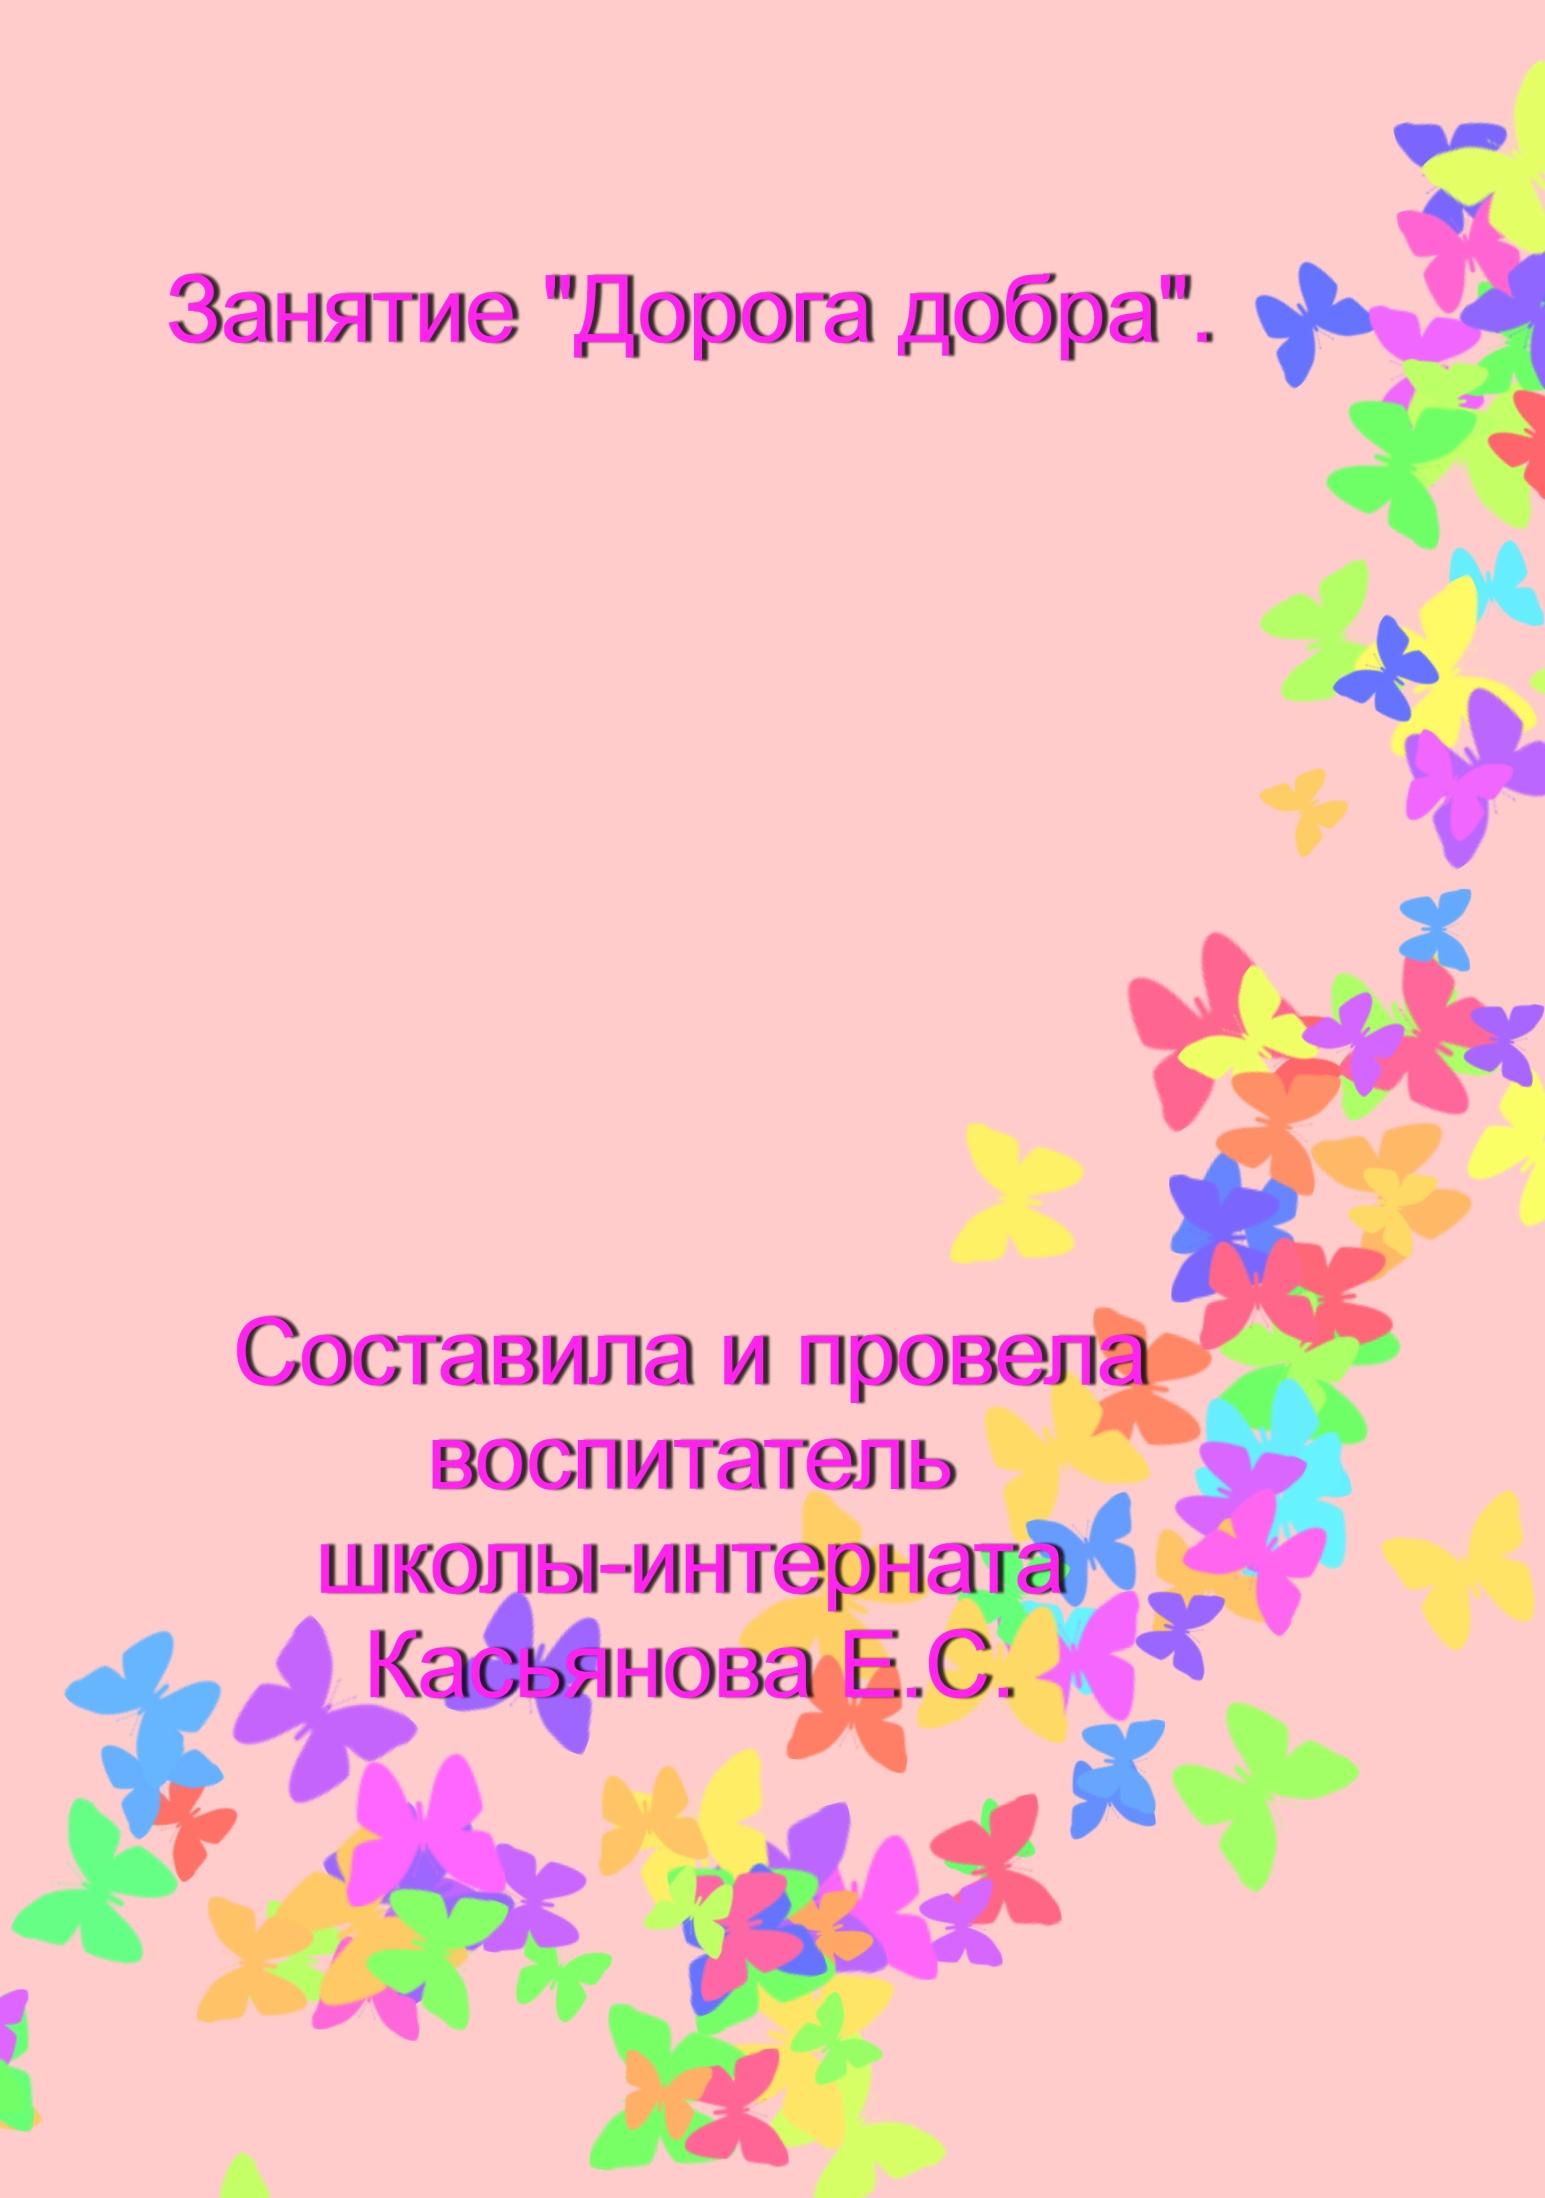 C:\Users\Алексей\Desktop\Скиданое\флешка\Untitled-4дорогя.jpg